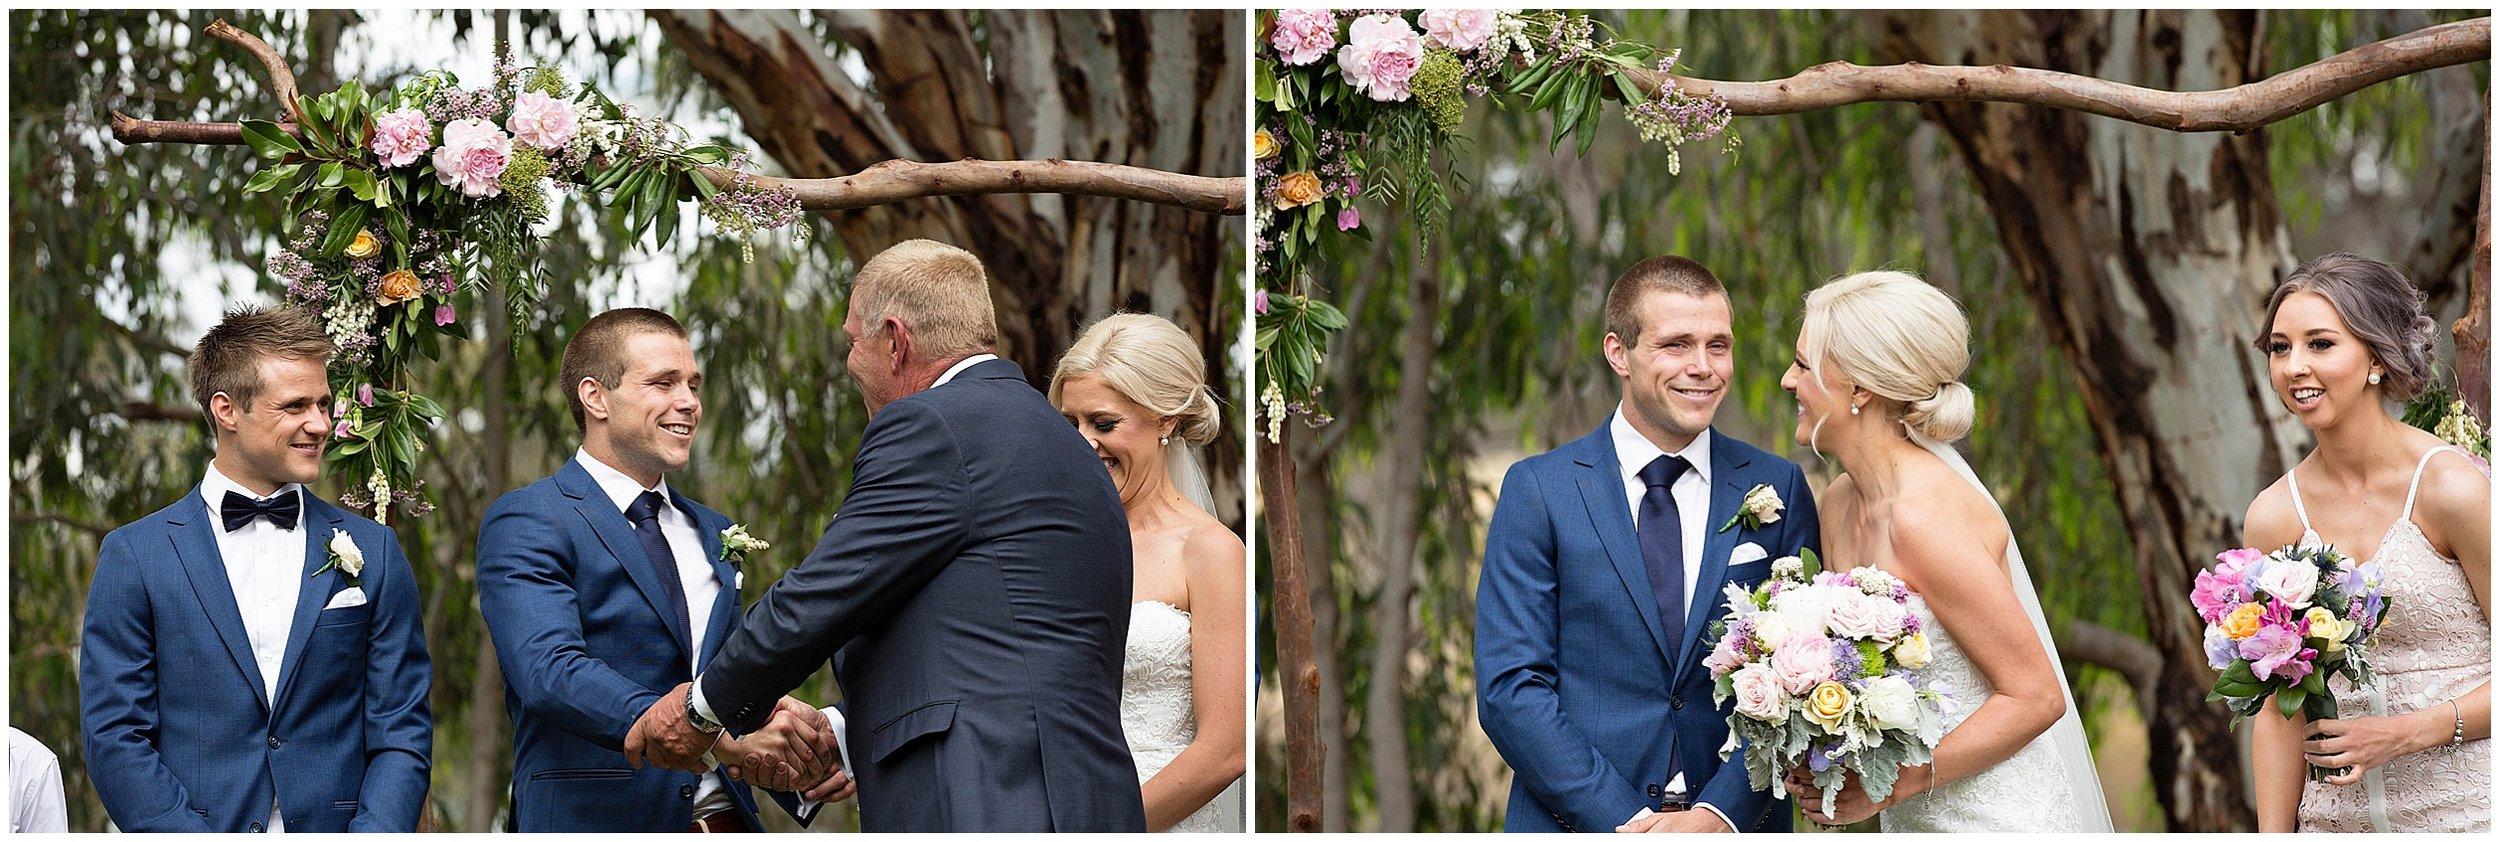 shepparton-wedding-photographer_0192.jpg